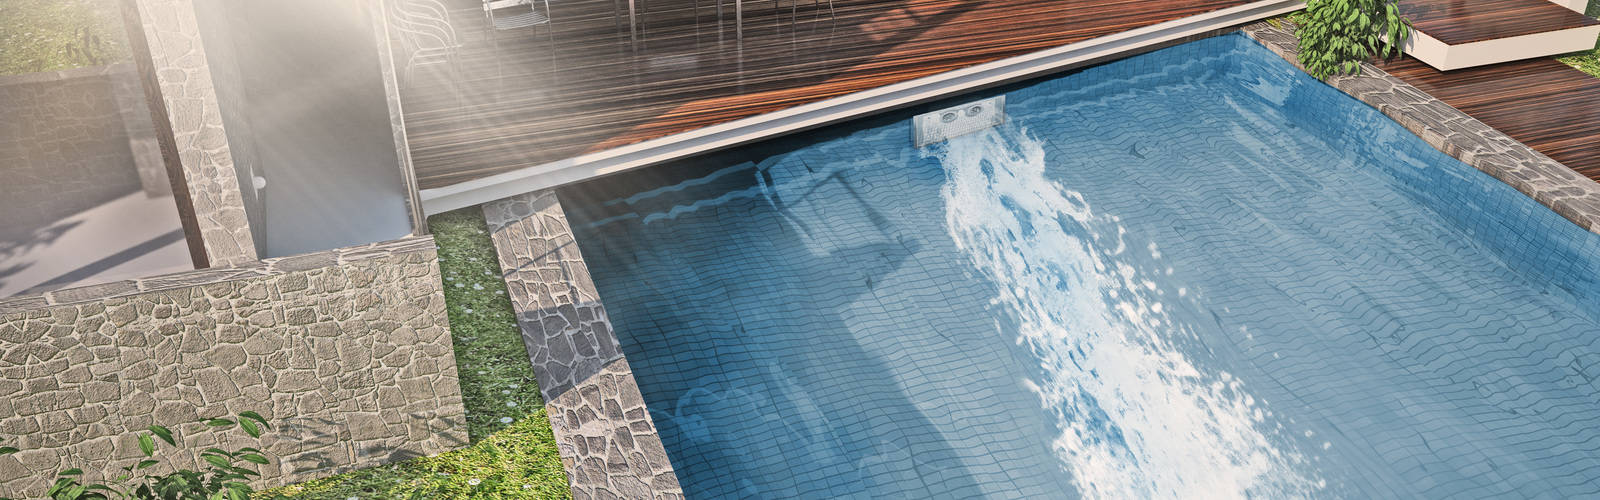 SK-Whirlpool - Pooltechnik